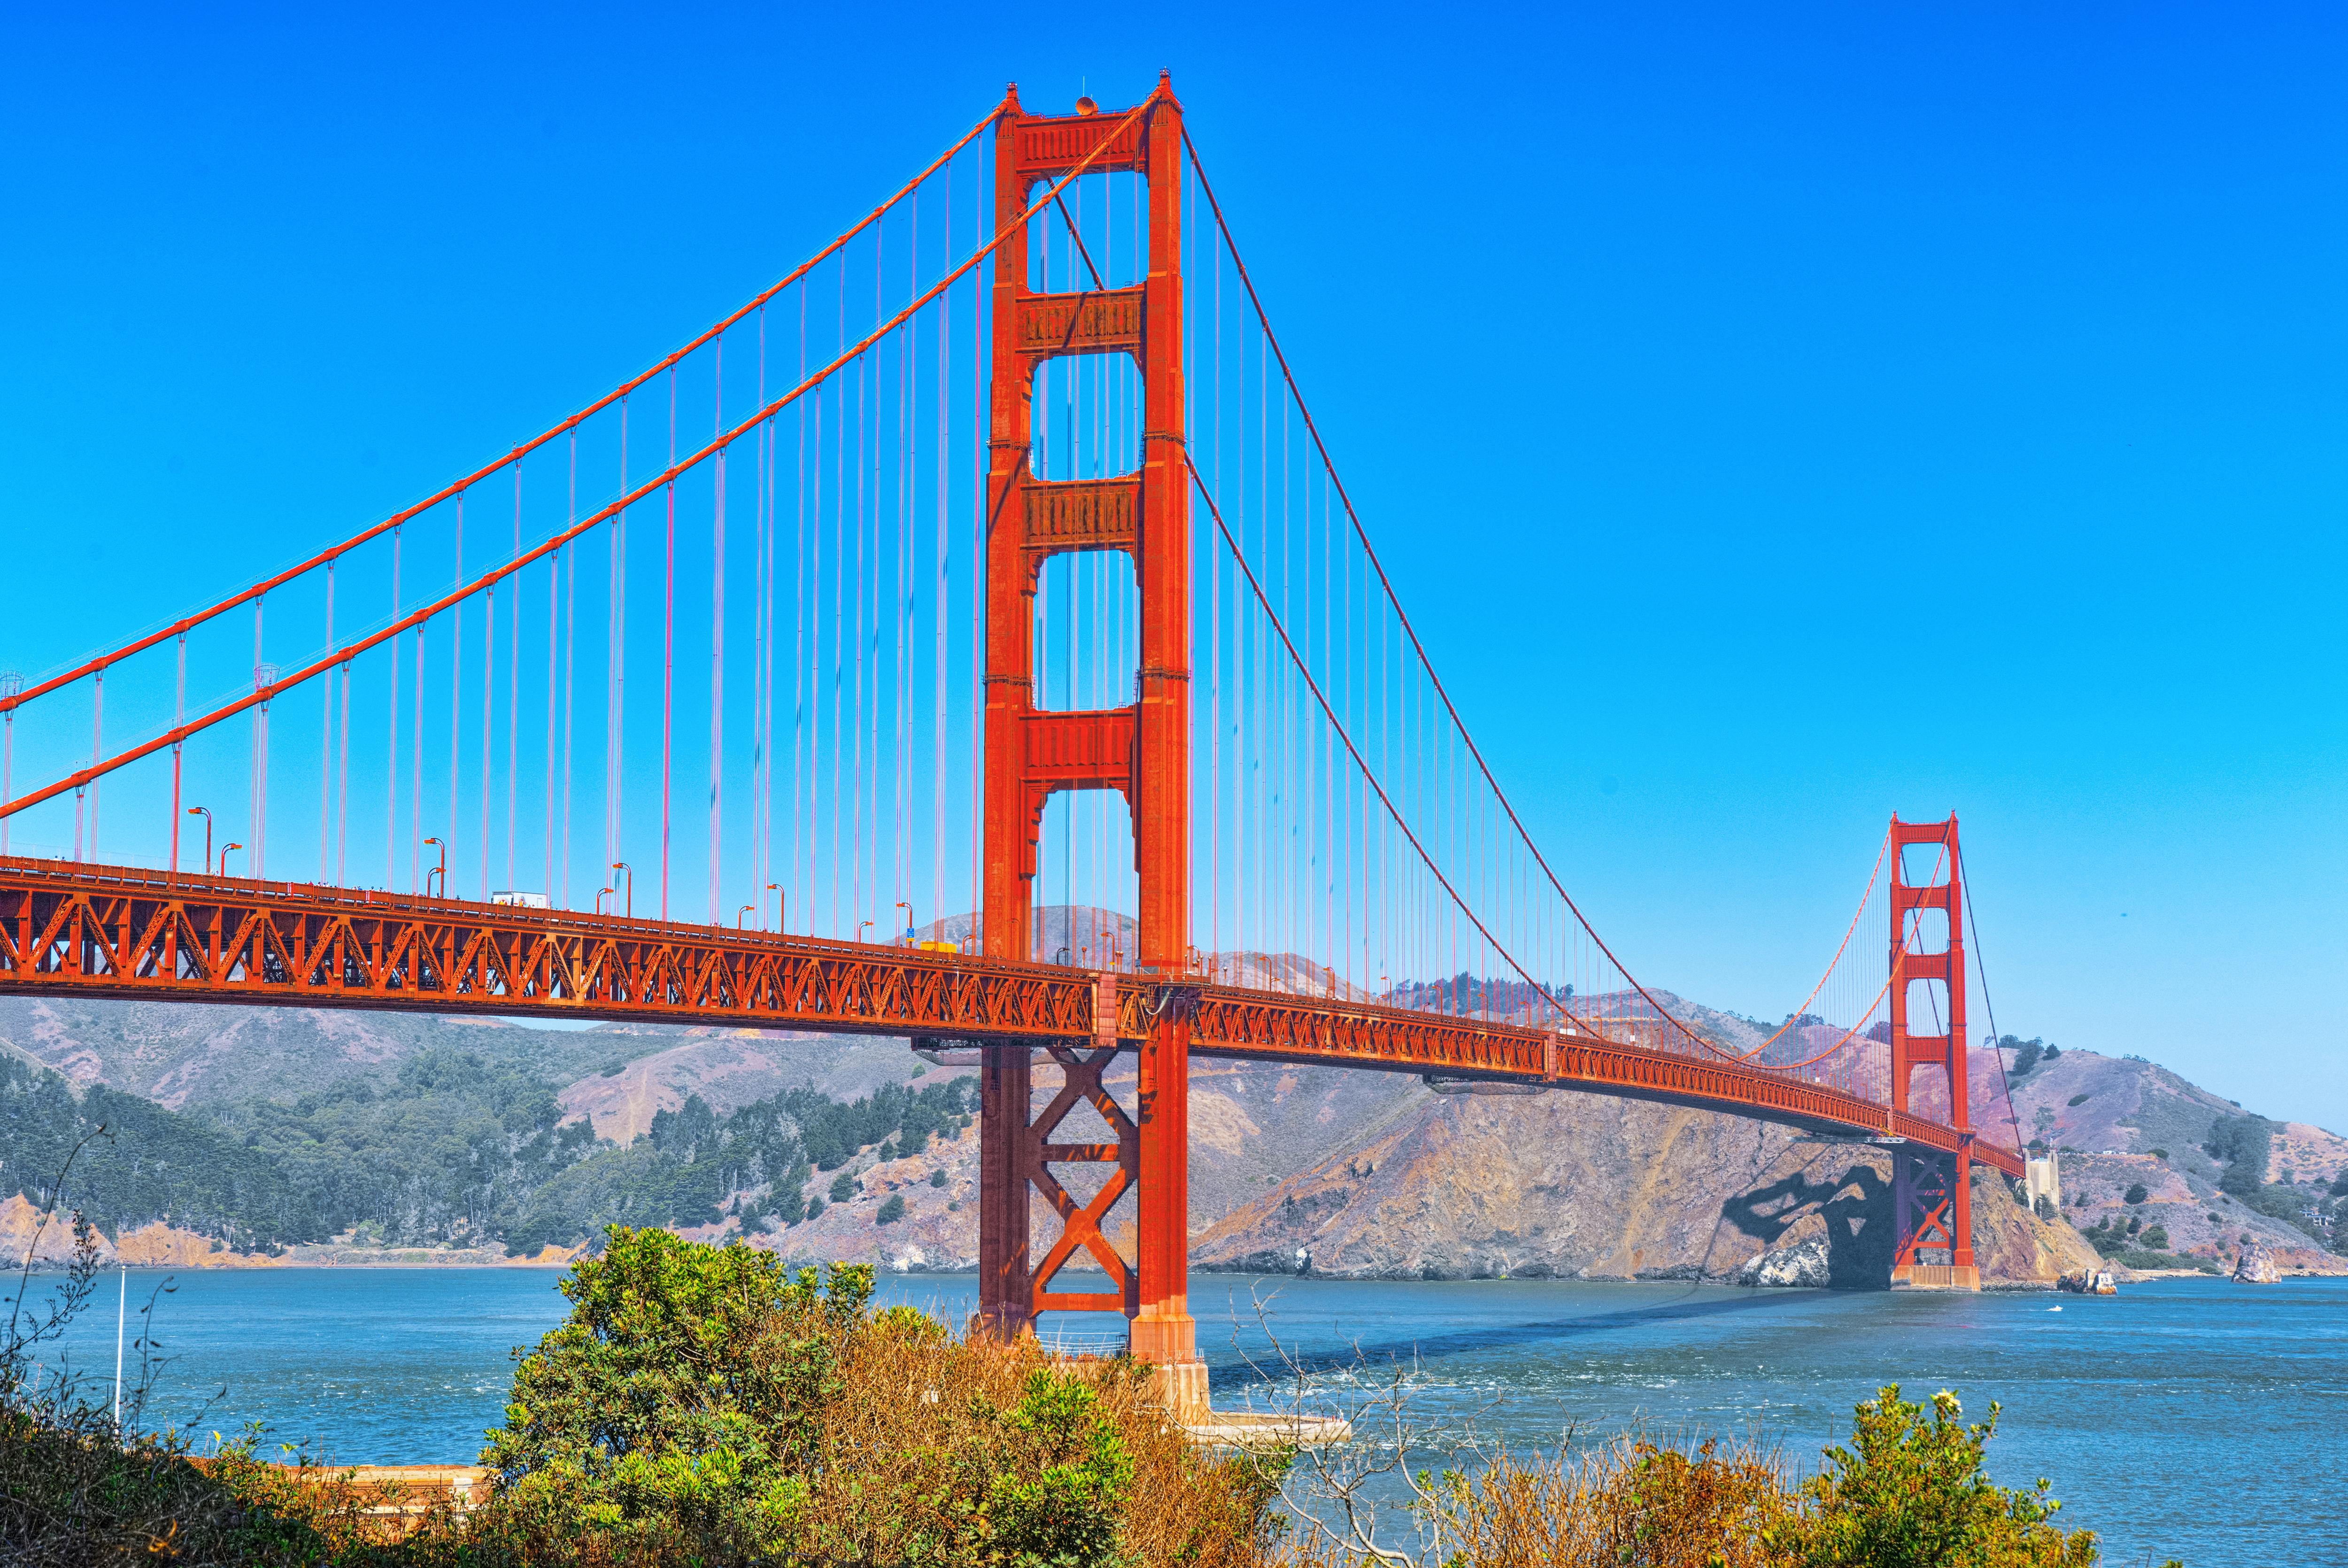 San Francisco (Brian Kinney/Shutterstock)